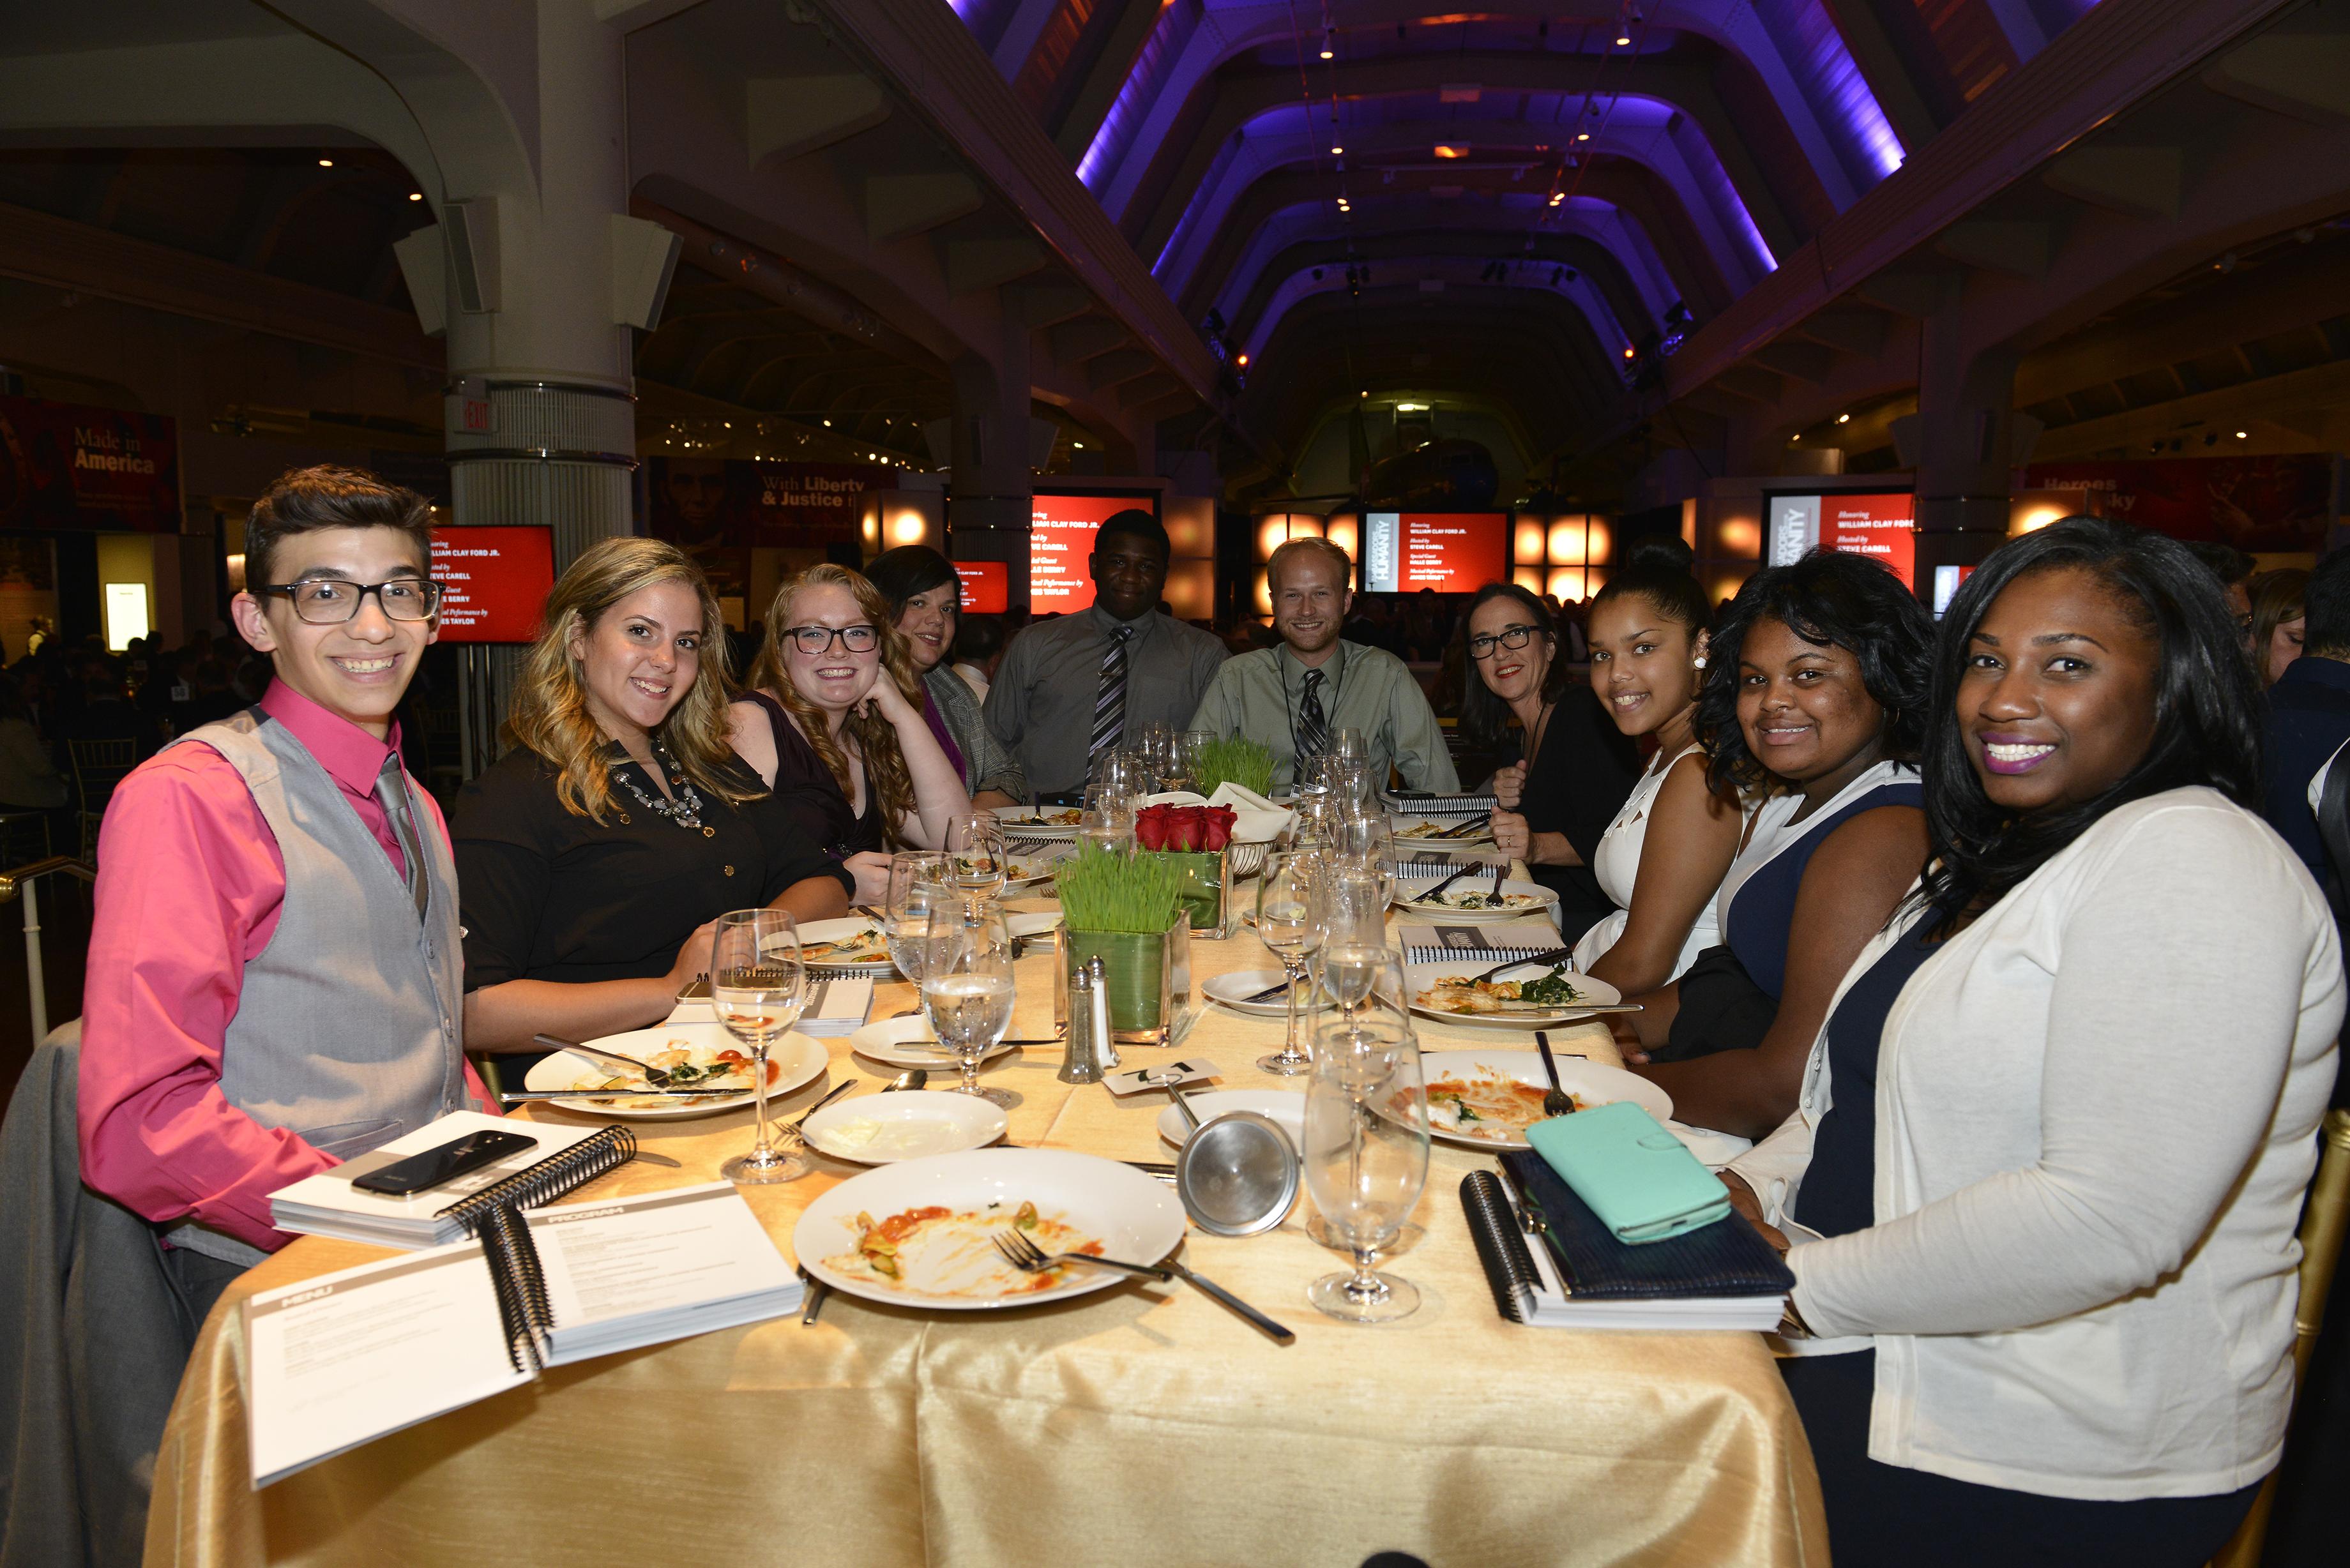 IWitness Detroit students enjoying the gala dinner